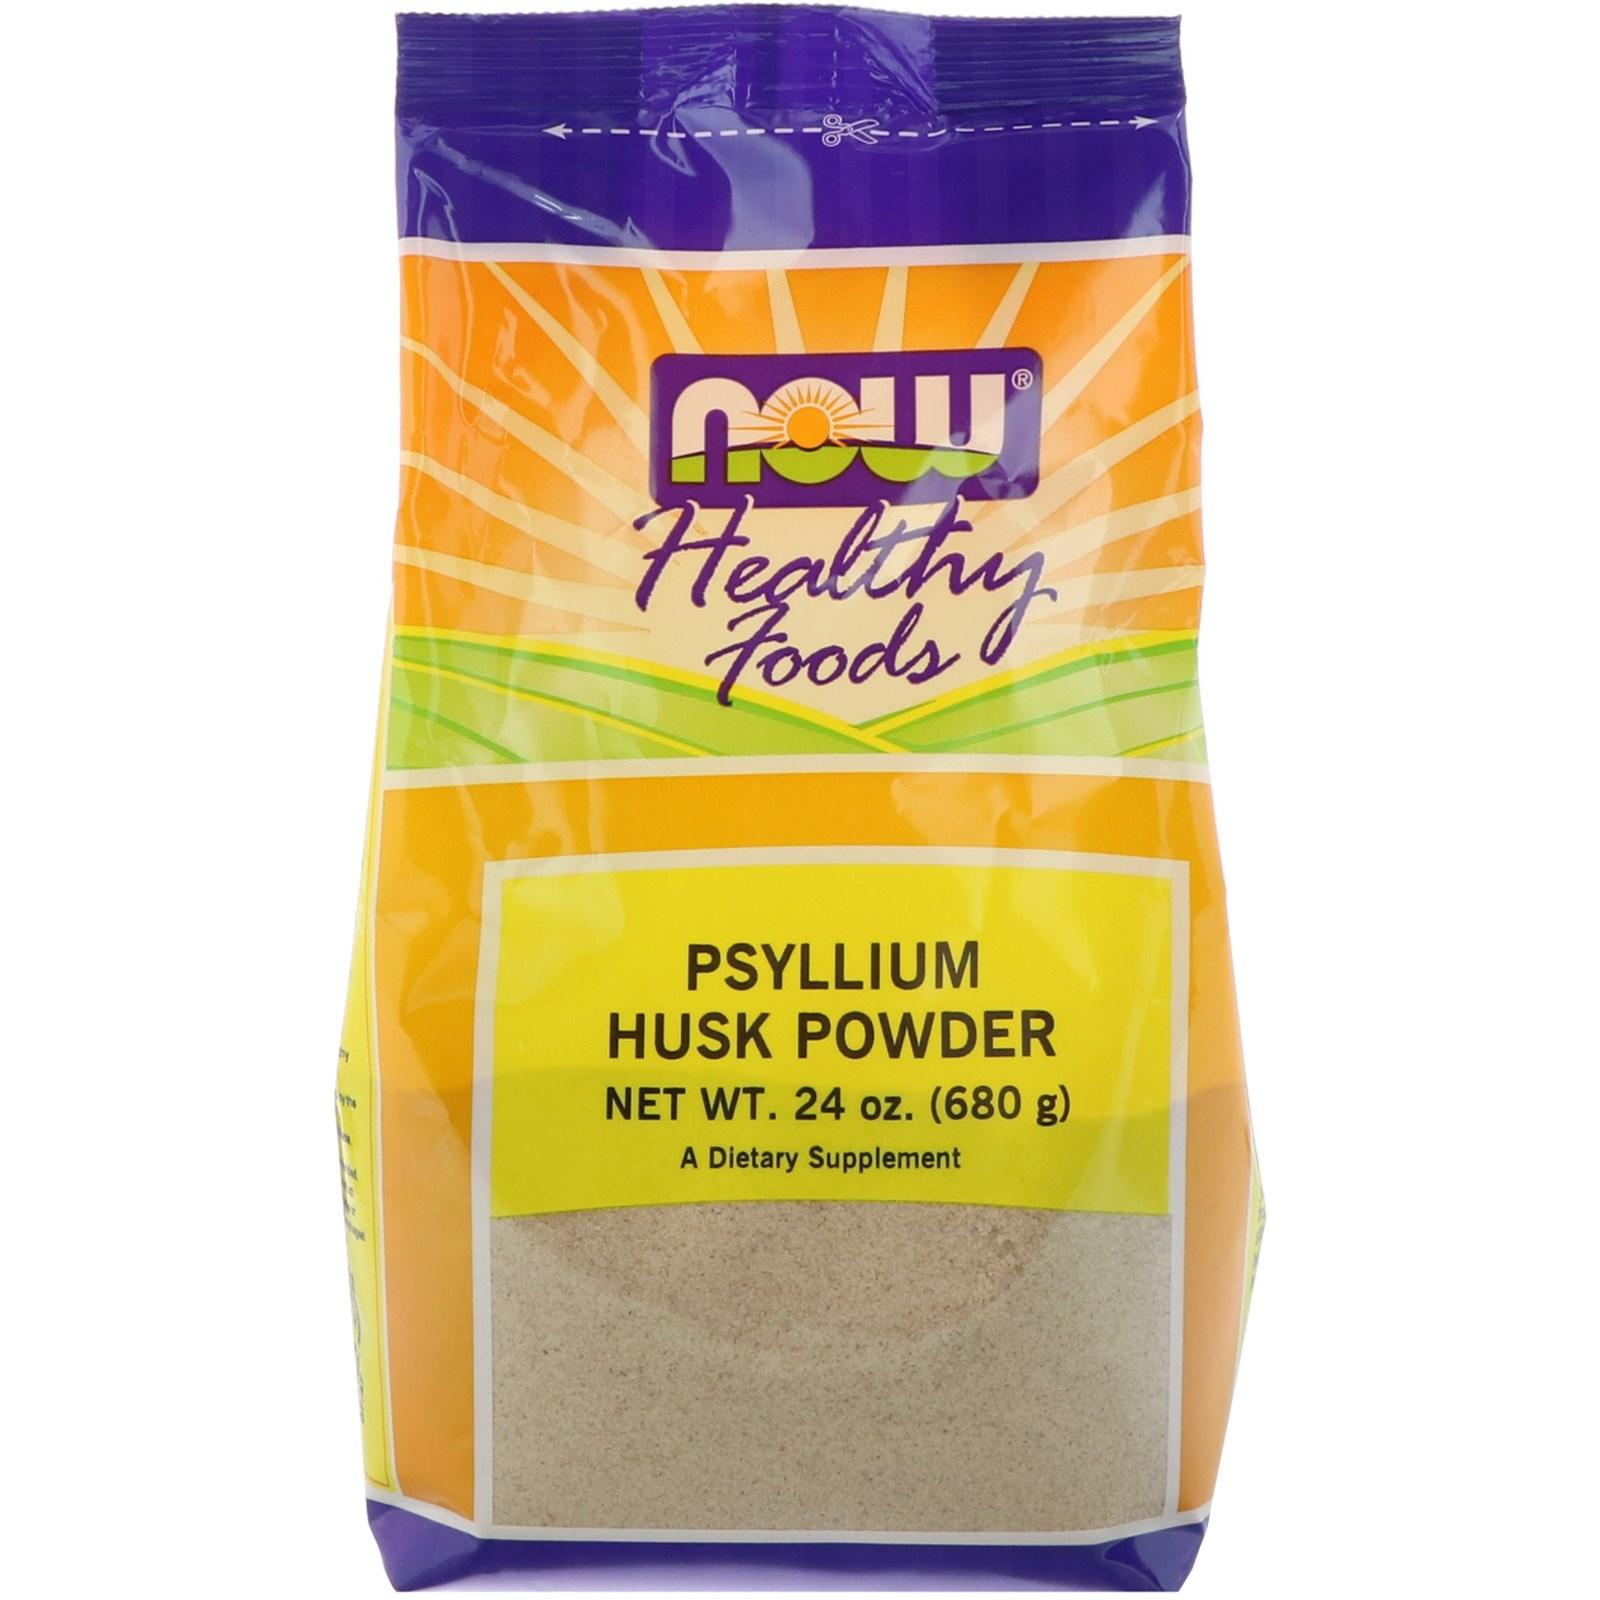 psyllium husk fibre weight loss